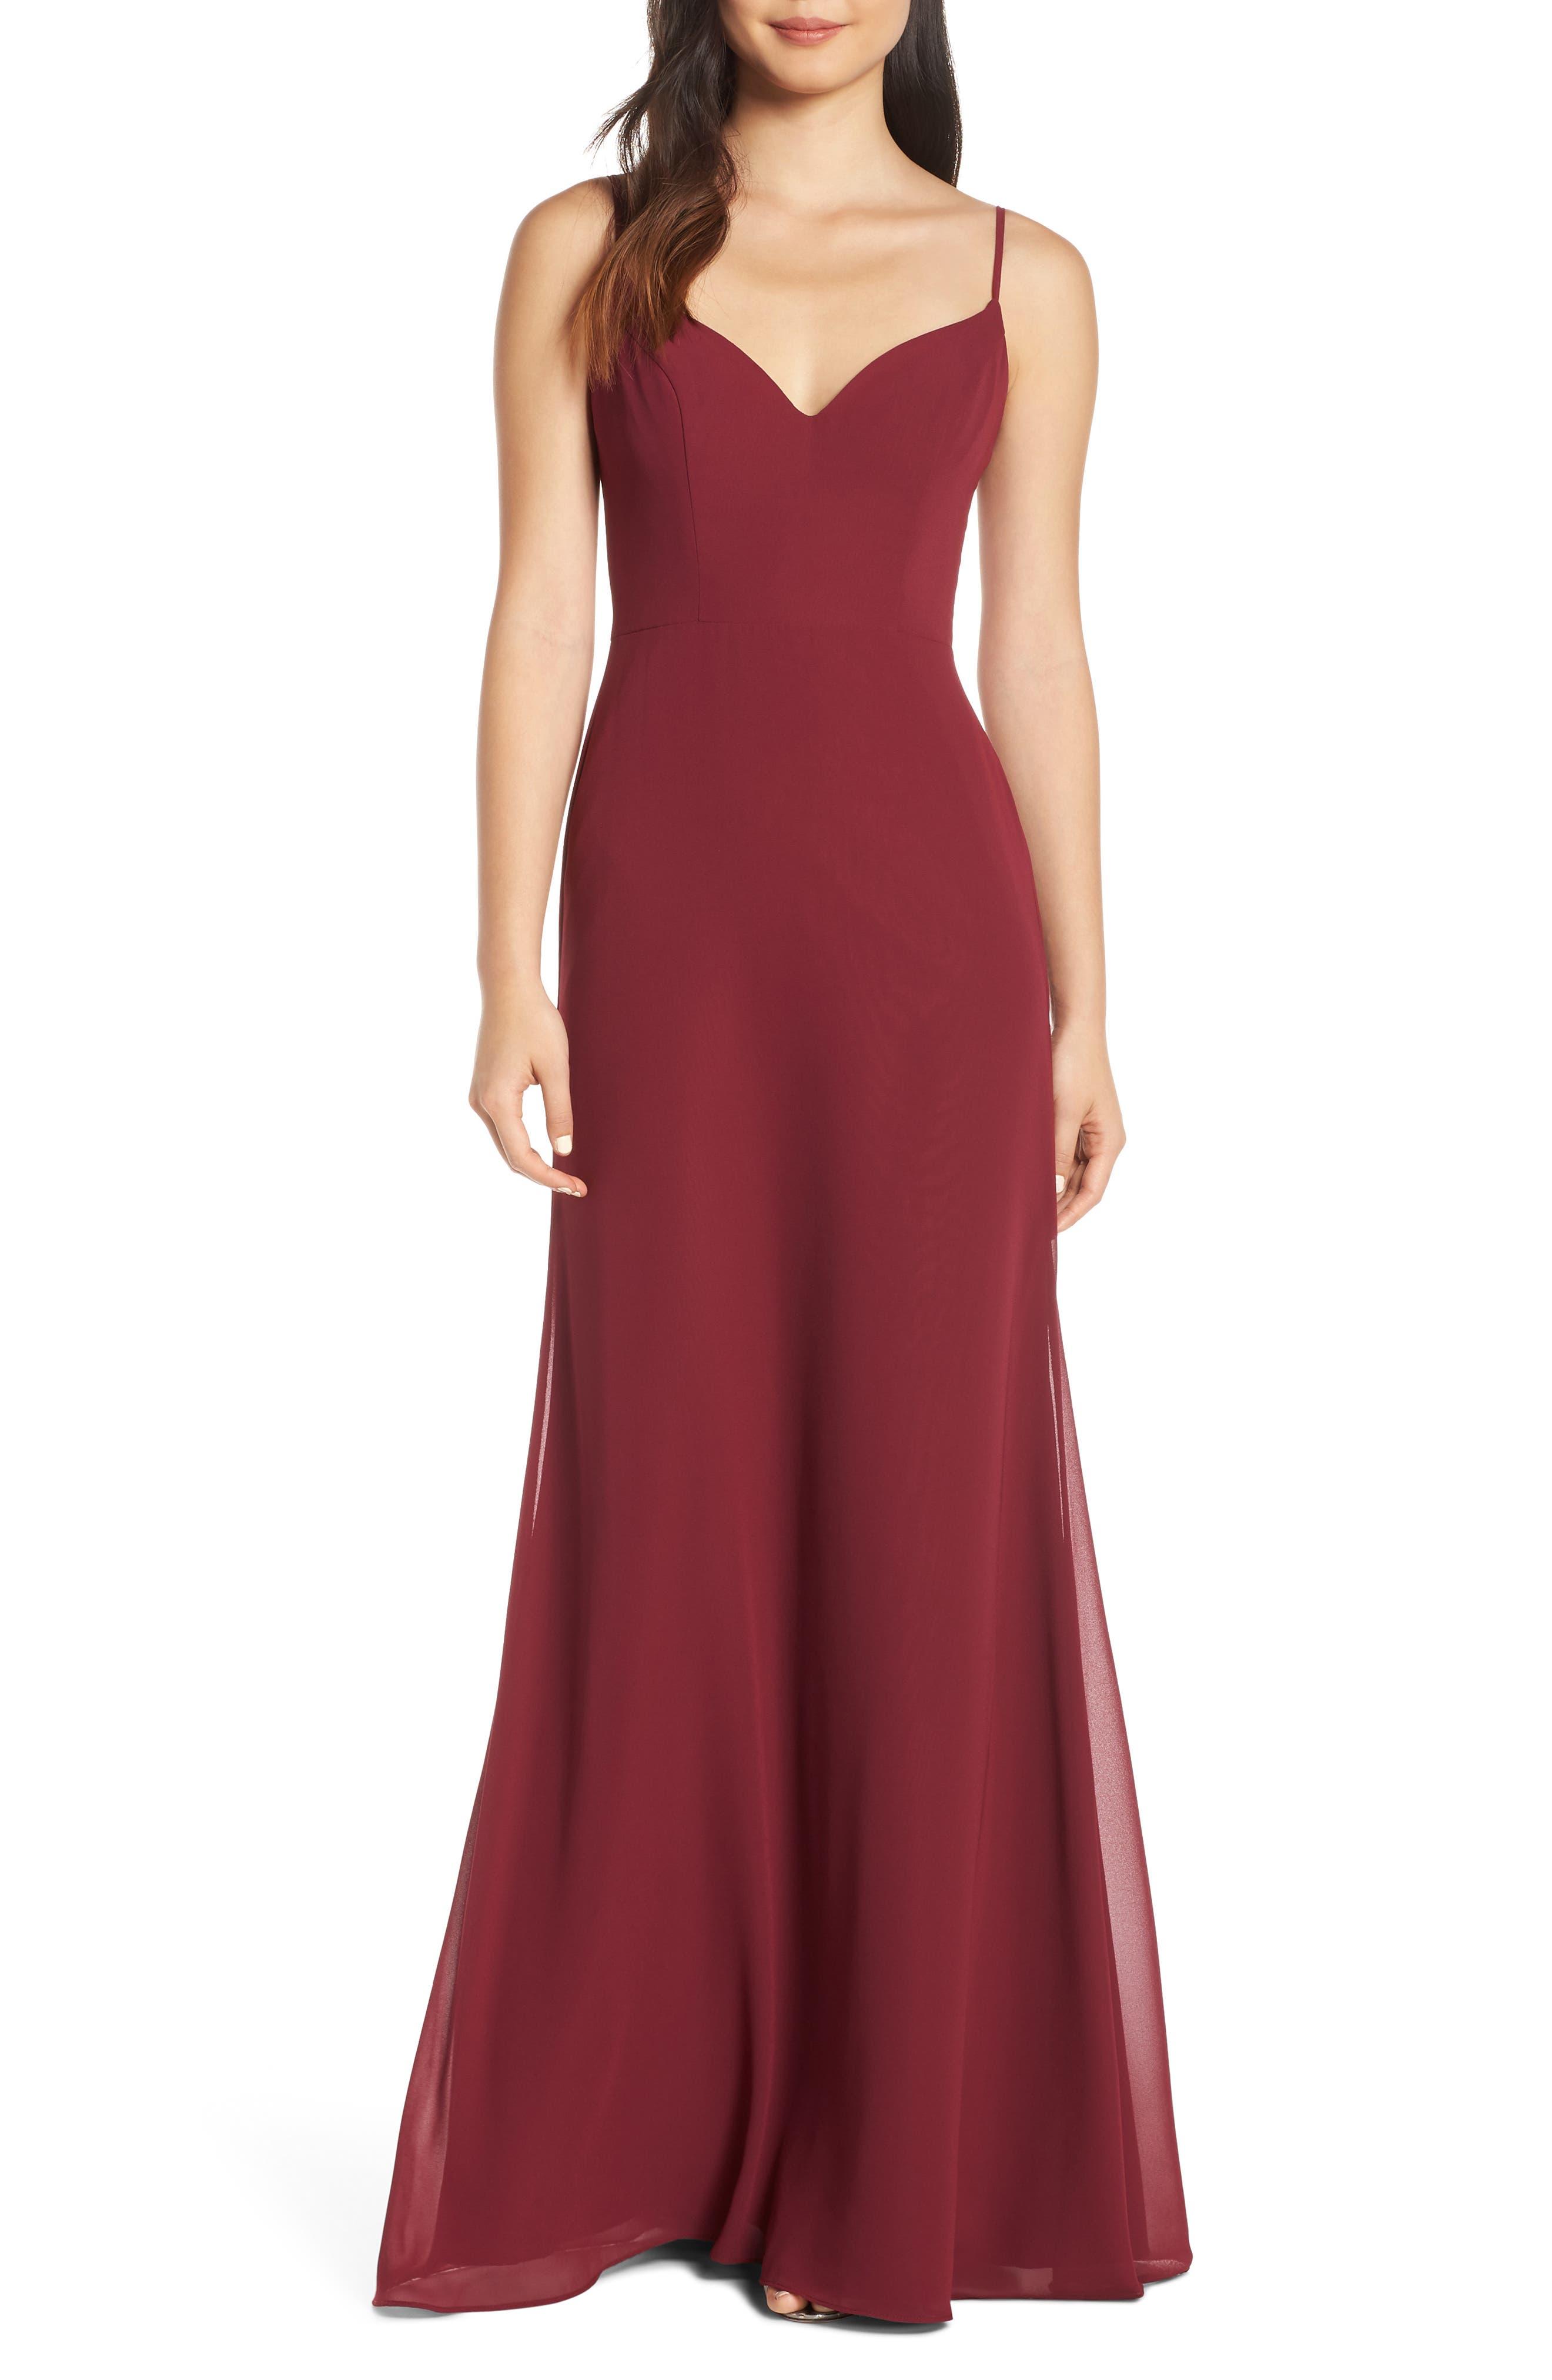 Hayley Paige Occasions V-Neck Chiffon Evening Dress, Burgundy